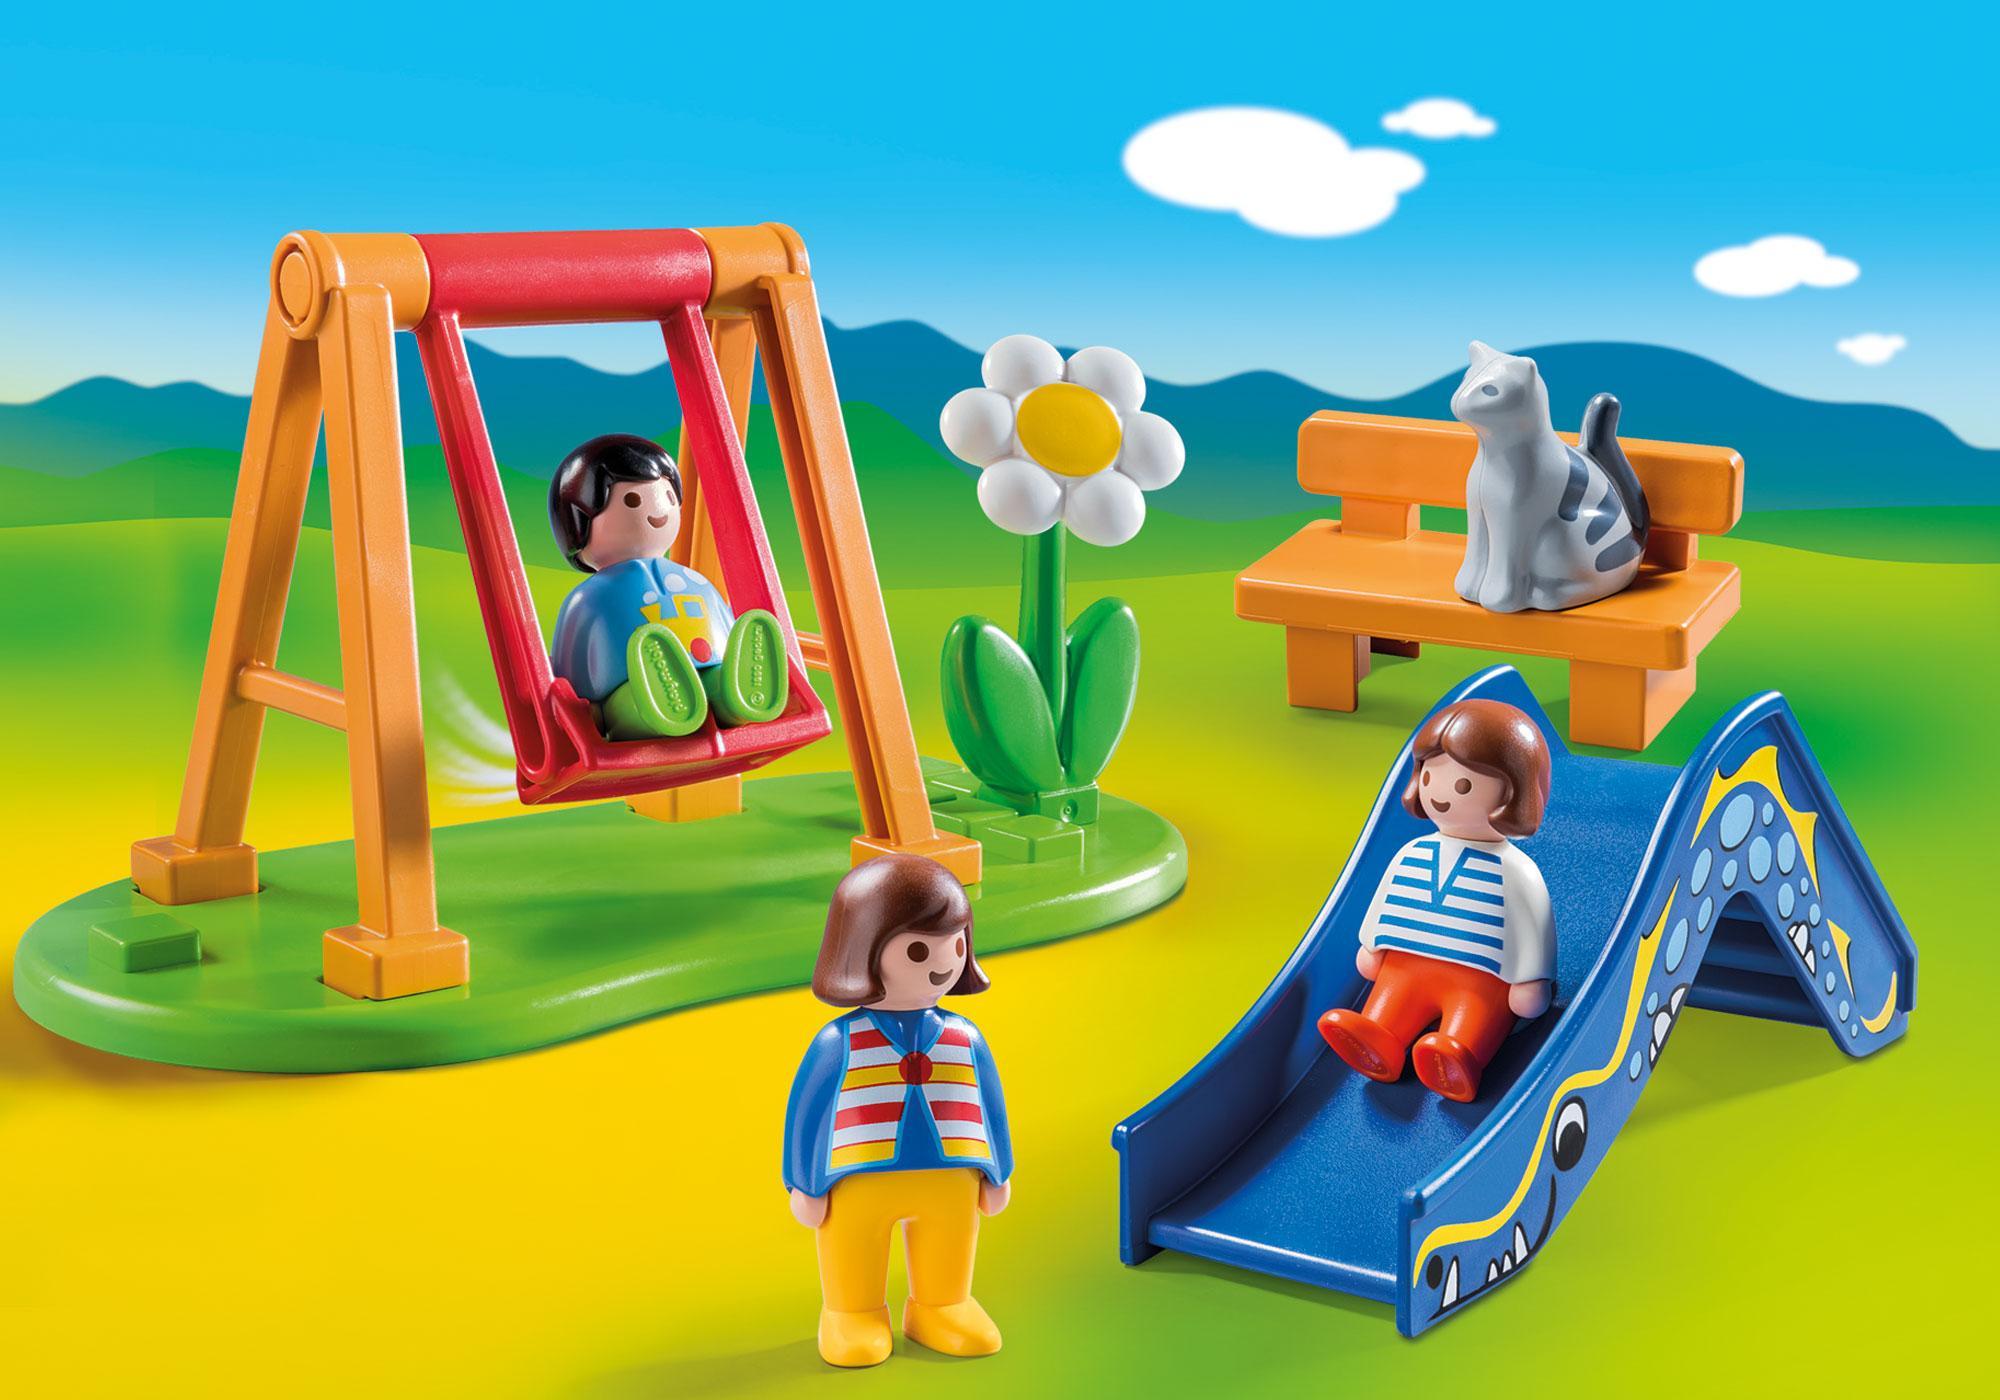 70130_product_detail/Kinderspielplatz